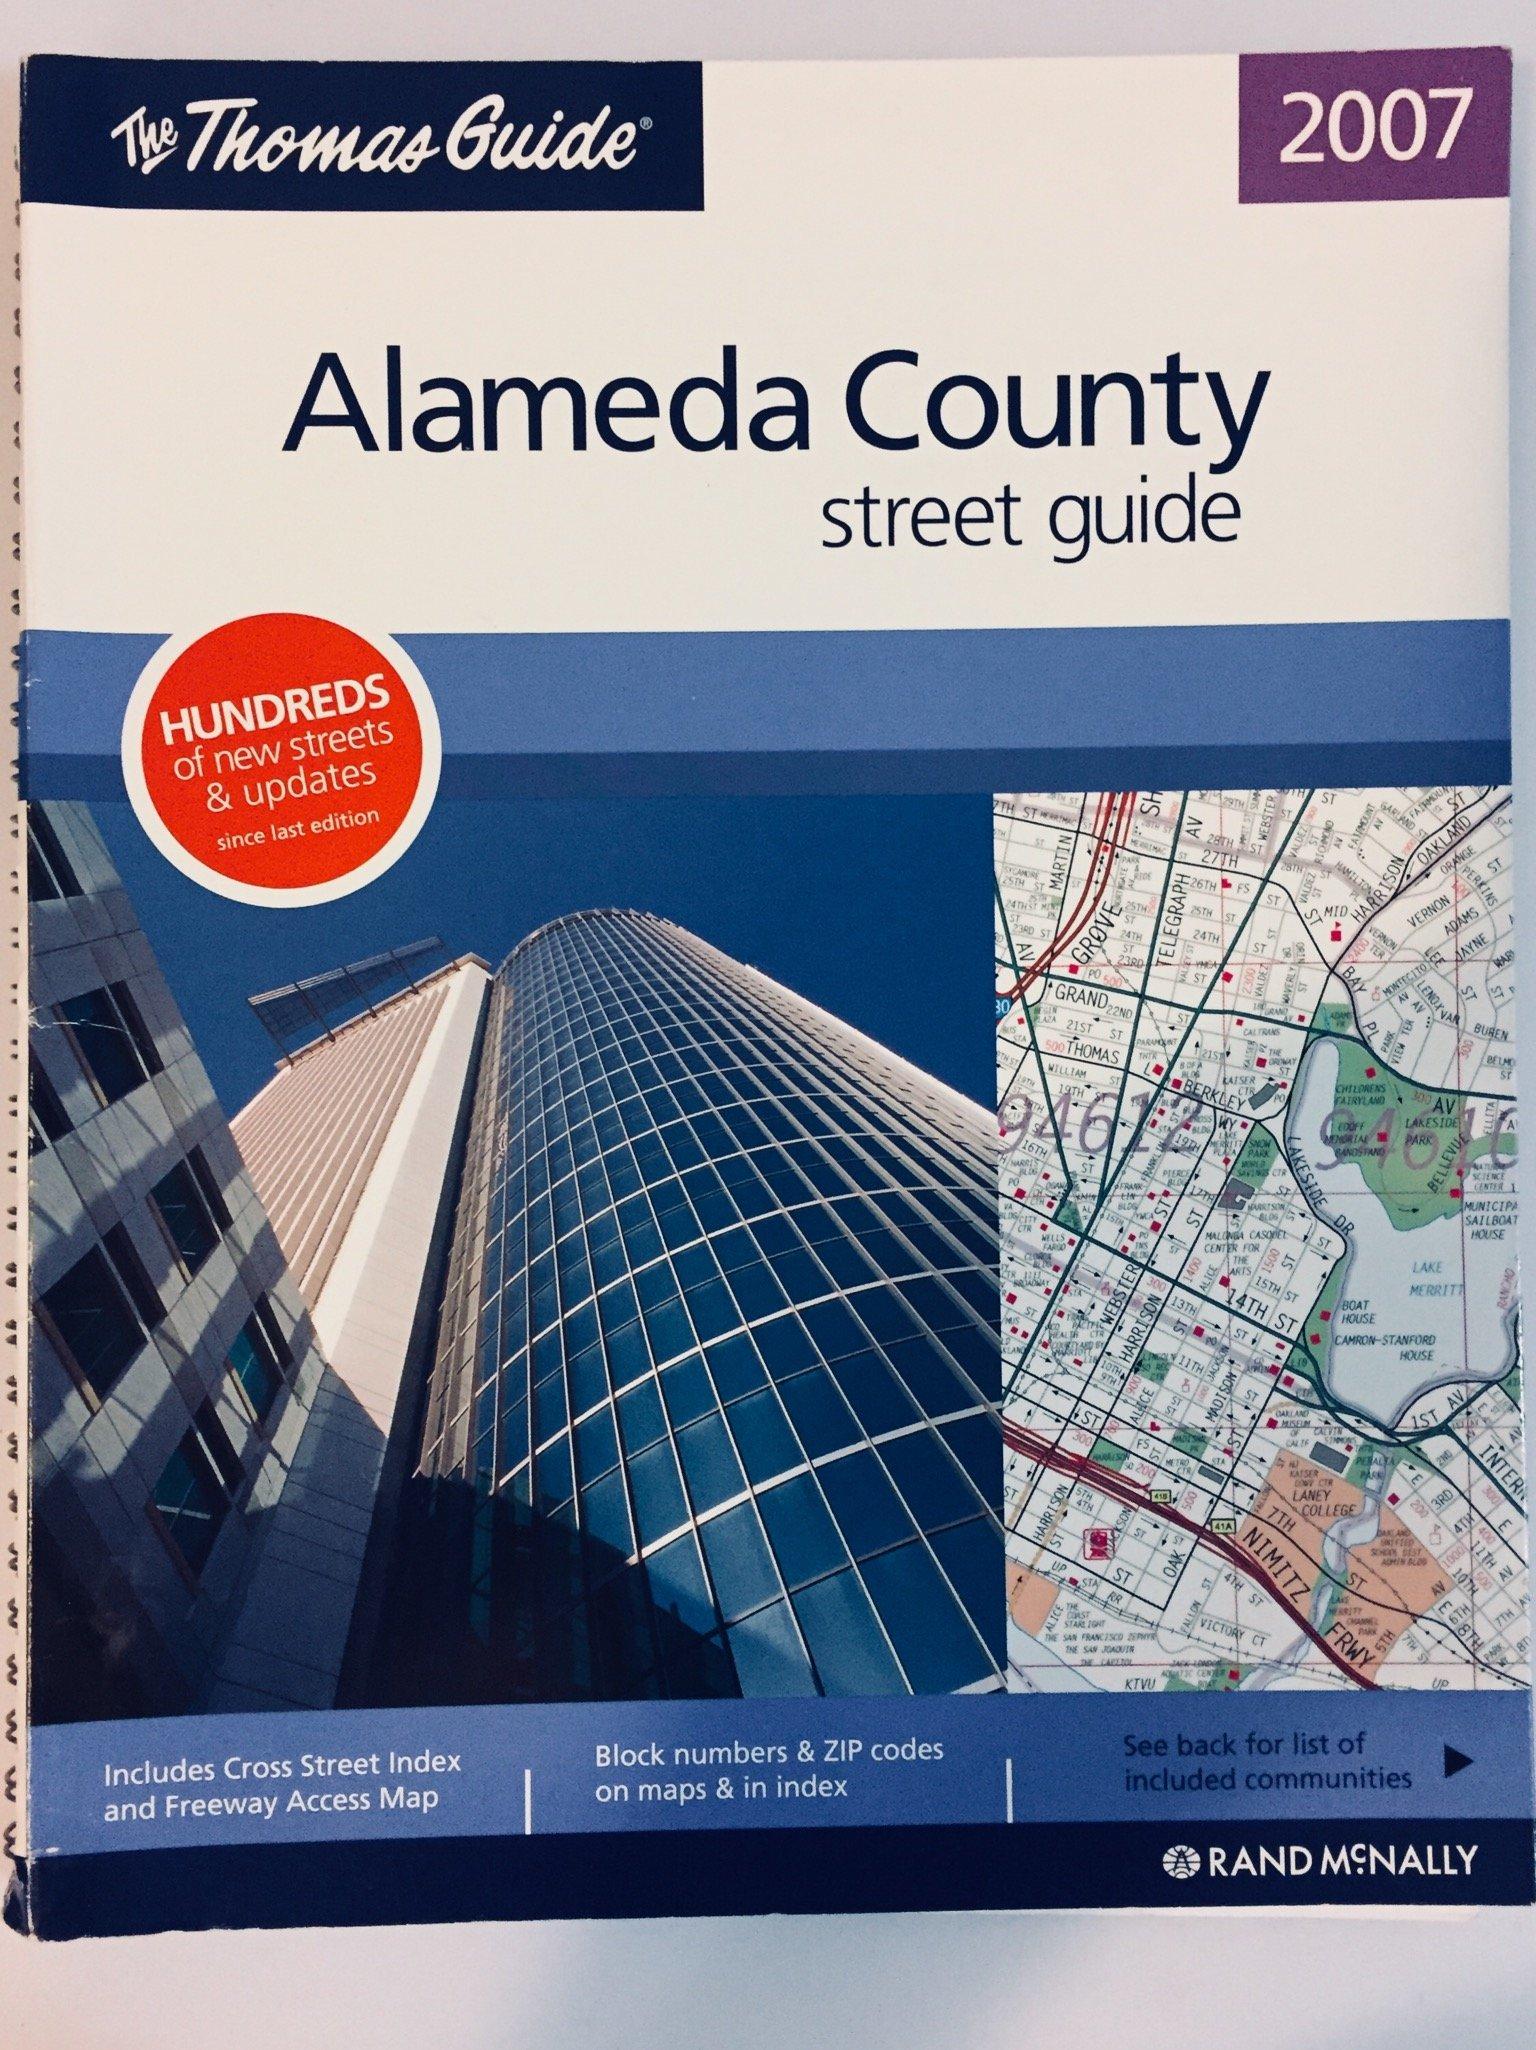 Download Thomas Guide 2008 Alameda County Street Guide (Thomas Guide Alameda County Street Guide & Directory) PDF